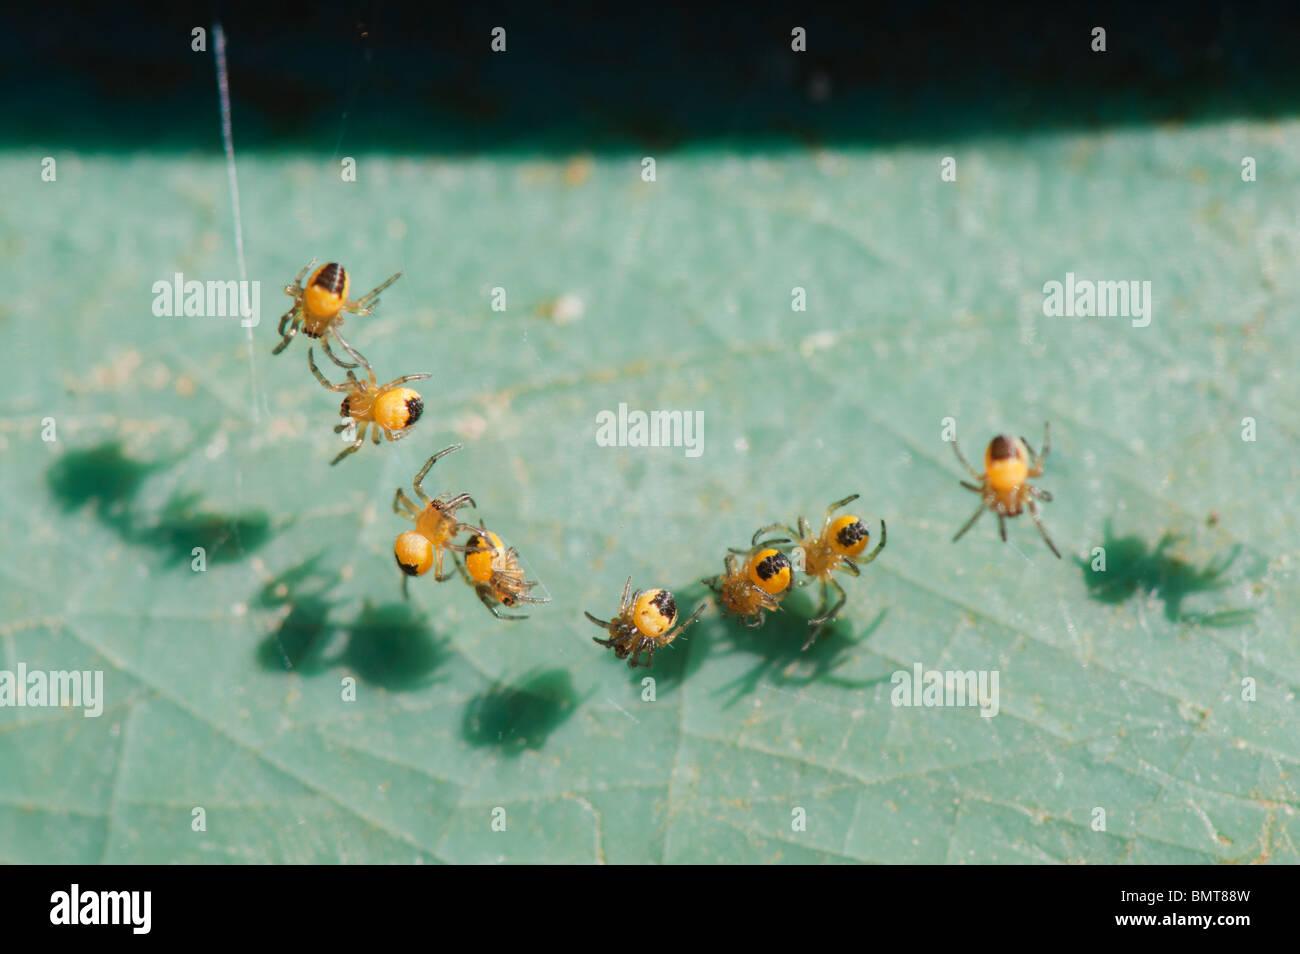 Araneus diadematus. Young cross orbweaver spiders macro - Stock Image